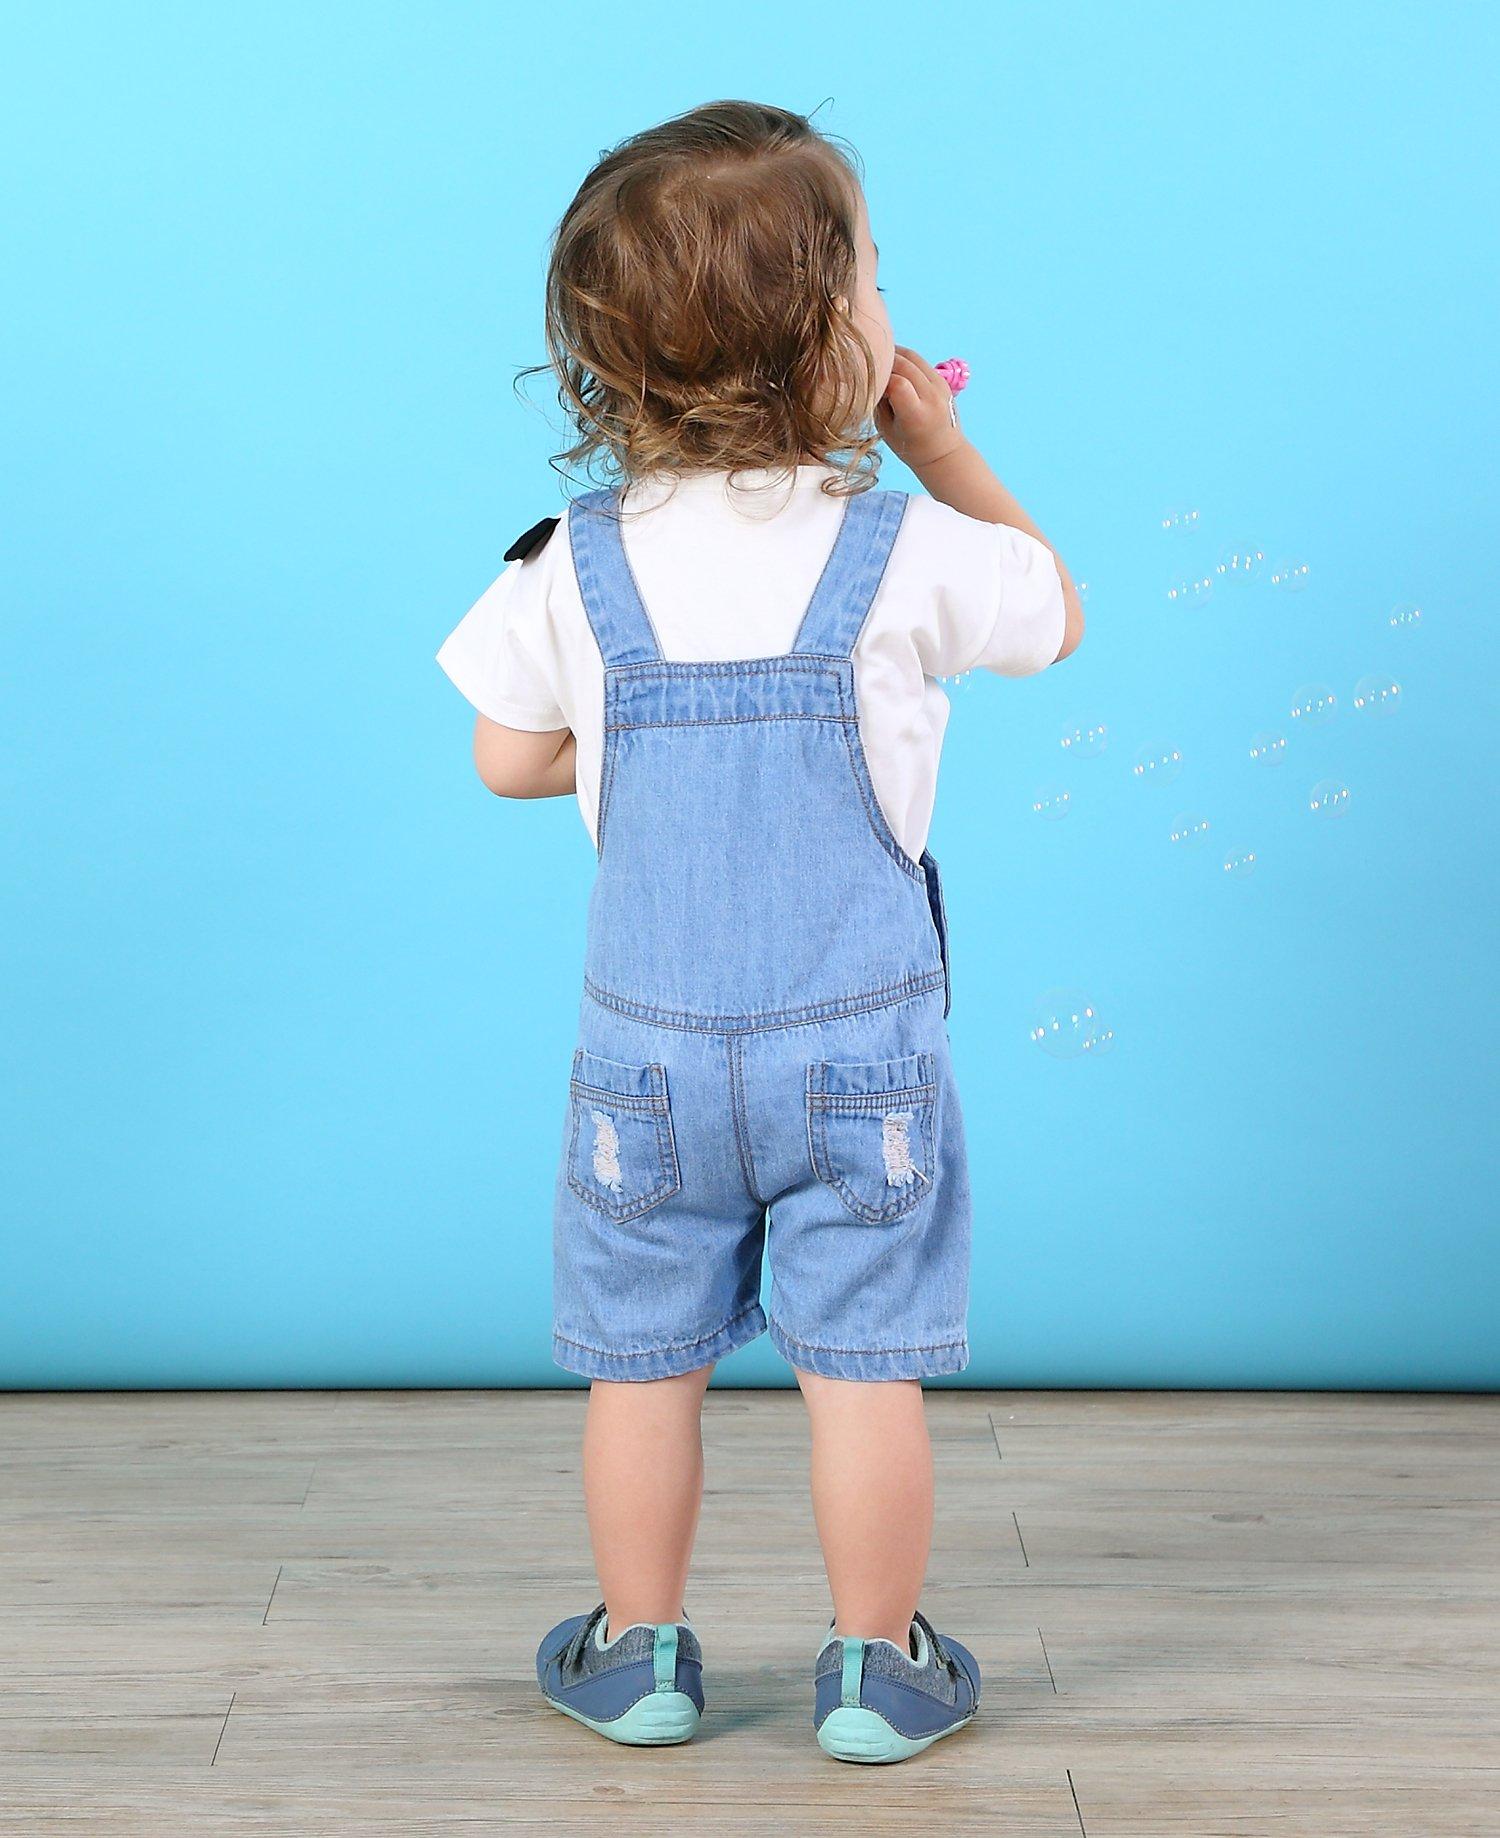 Kidscool Baby & Toddler Girls/Boys Big Bibs Ripped Hole Summer Jeans Shortalls,Light Blue,4-5 Years by Kidscool (Image #3)